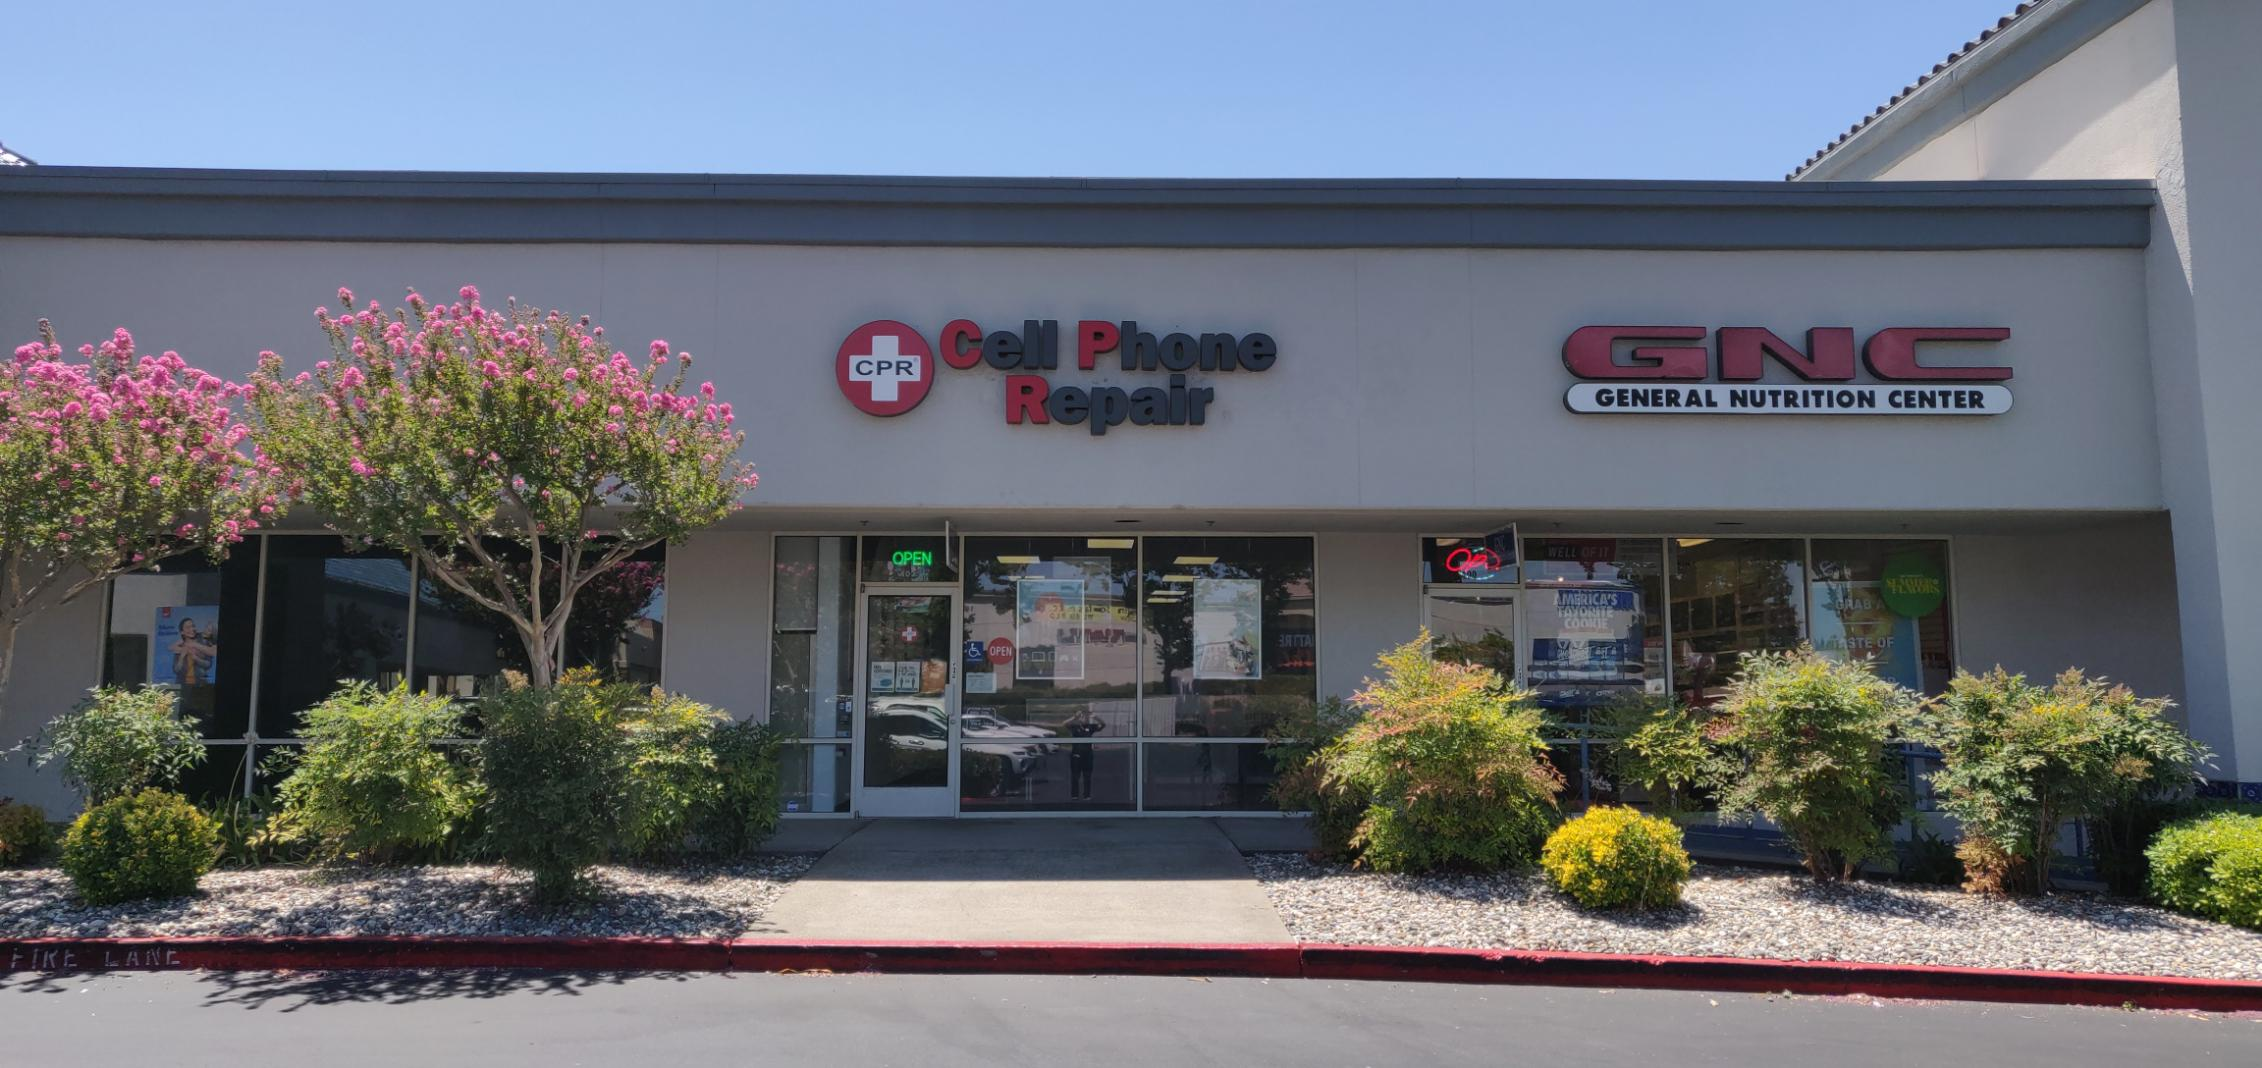 CPR Cell Phone Repair Roseville